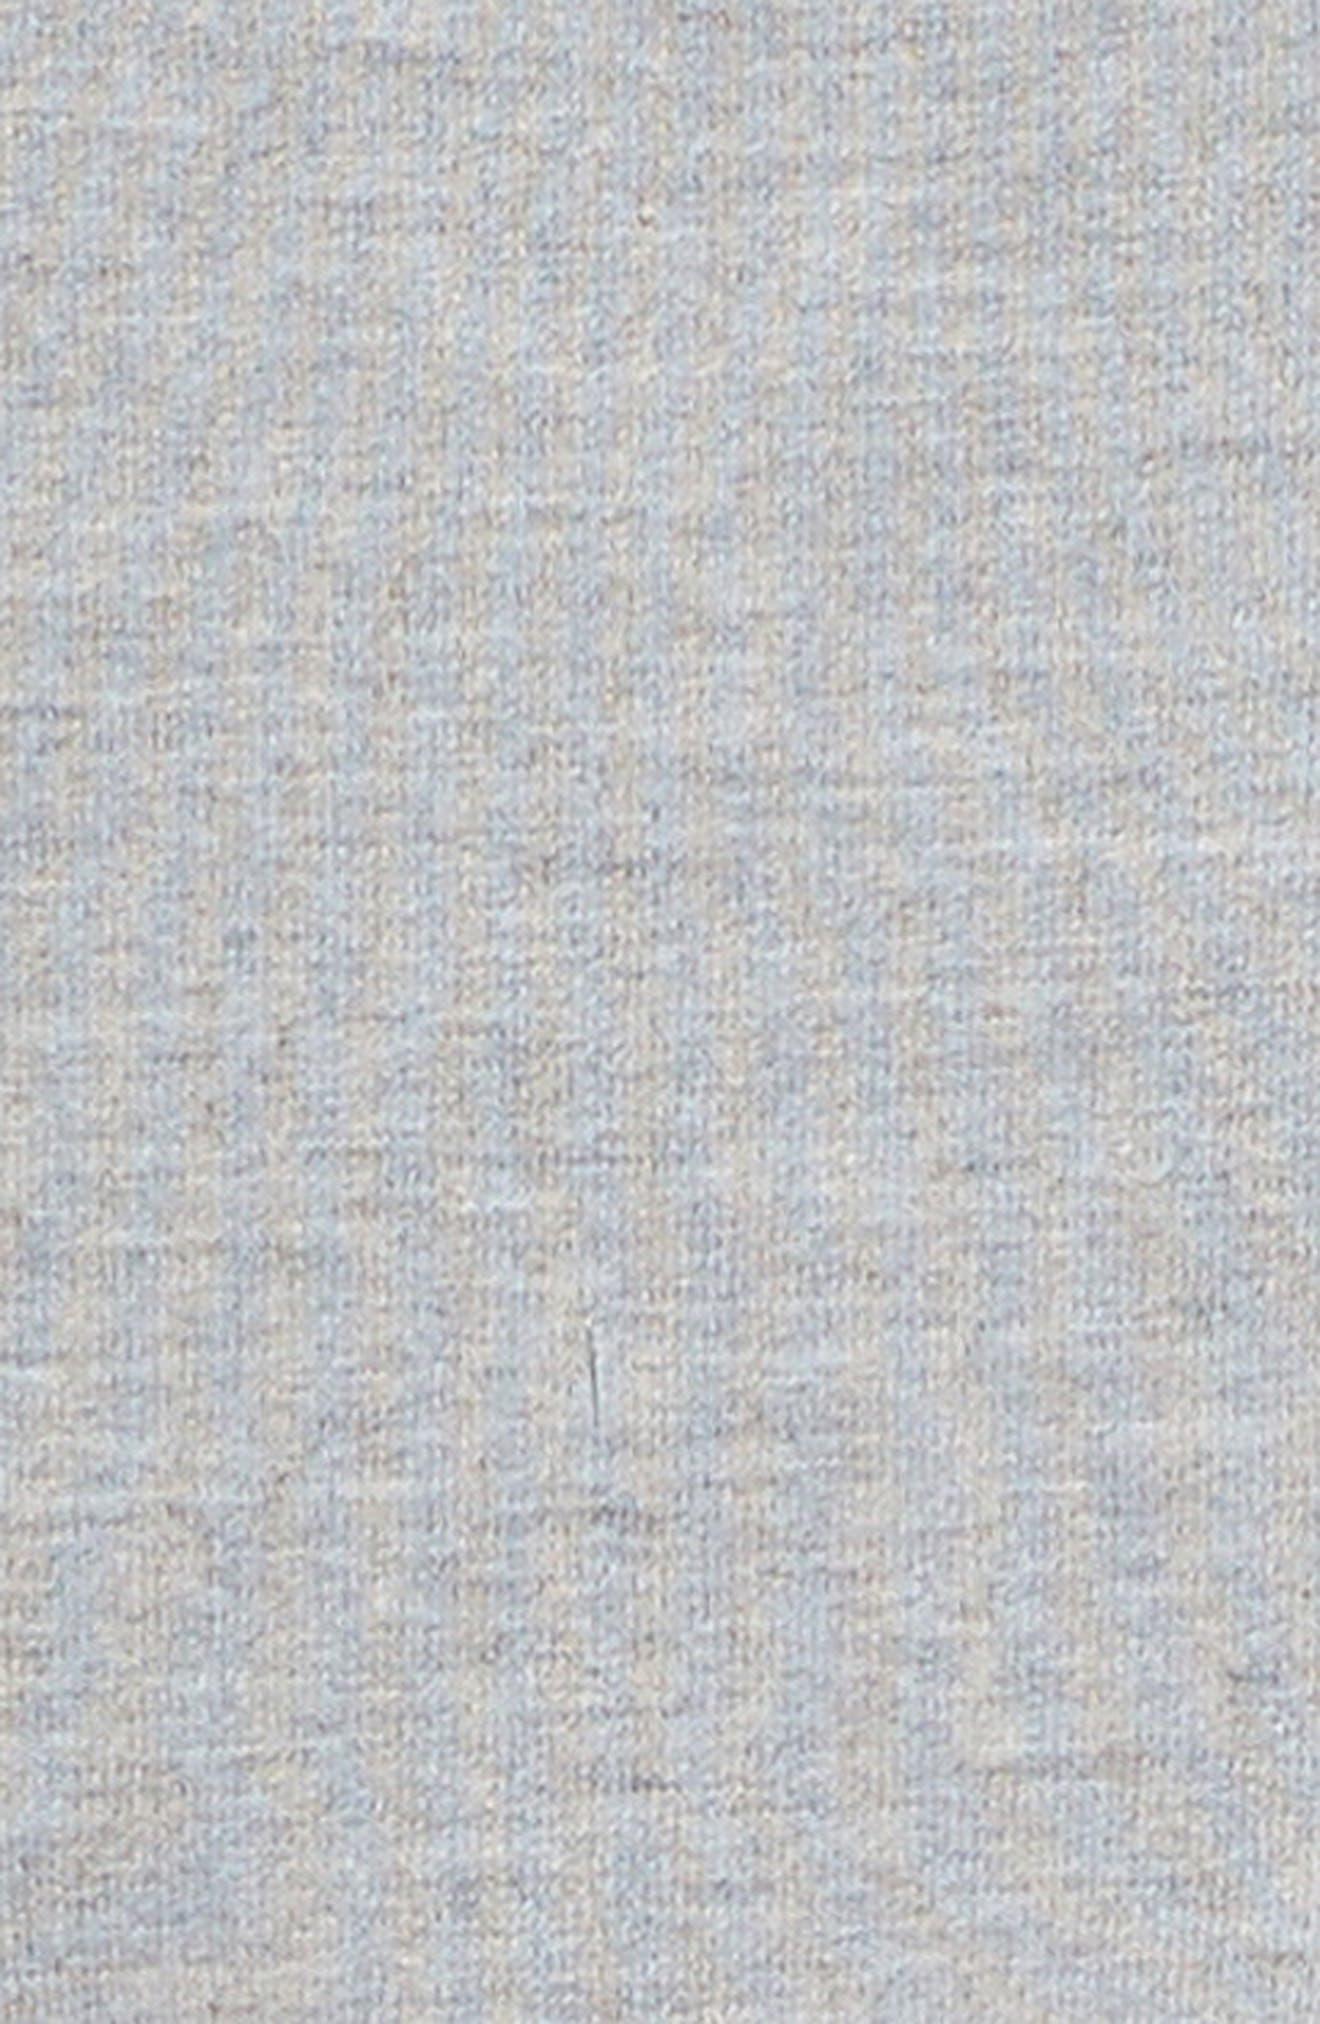 Frill of It Ruffle Dress,                             Alternate thumbnail 3, color,                             050